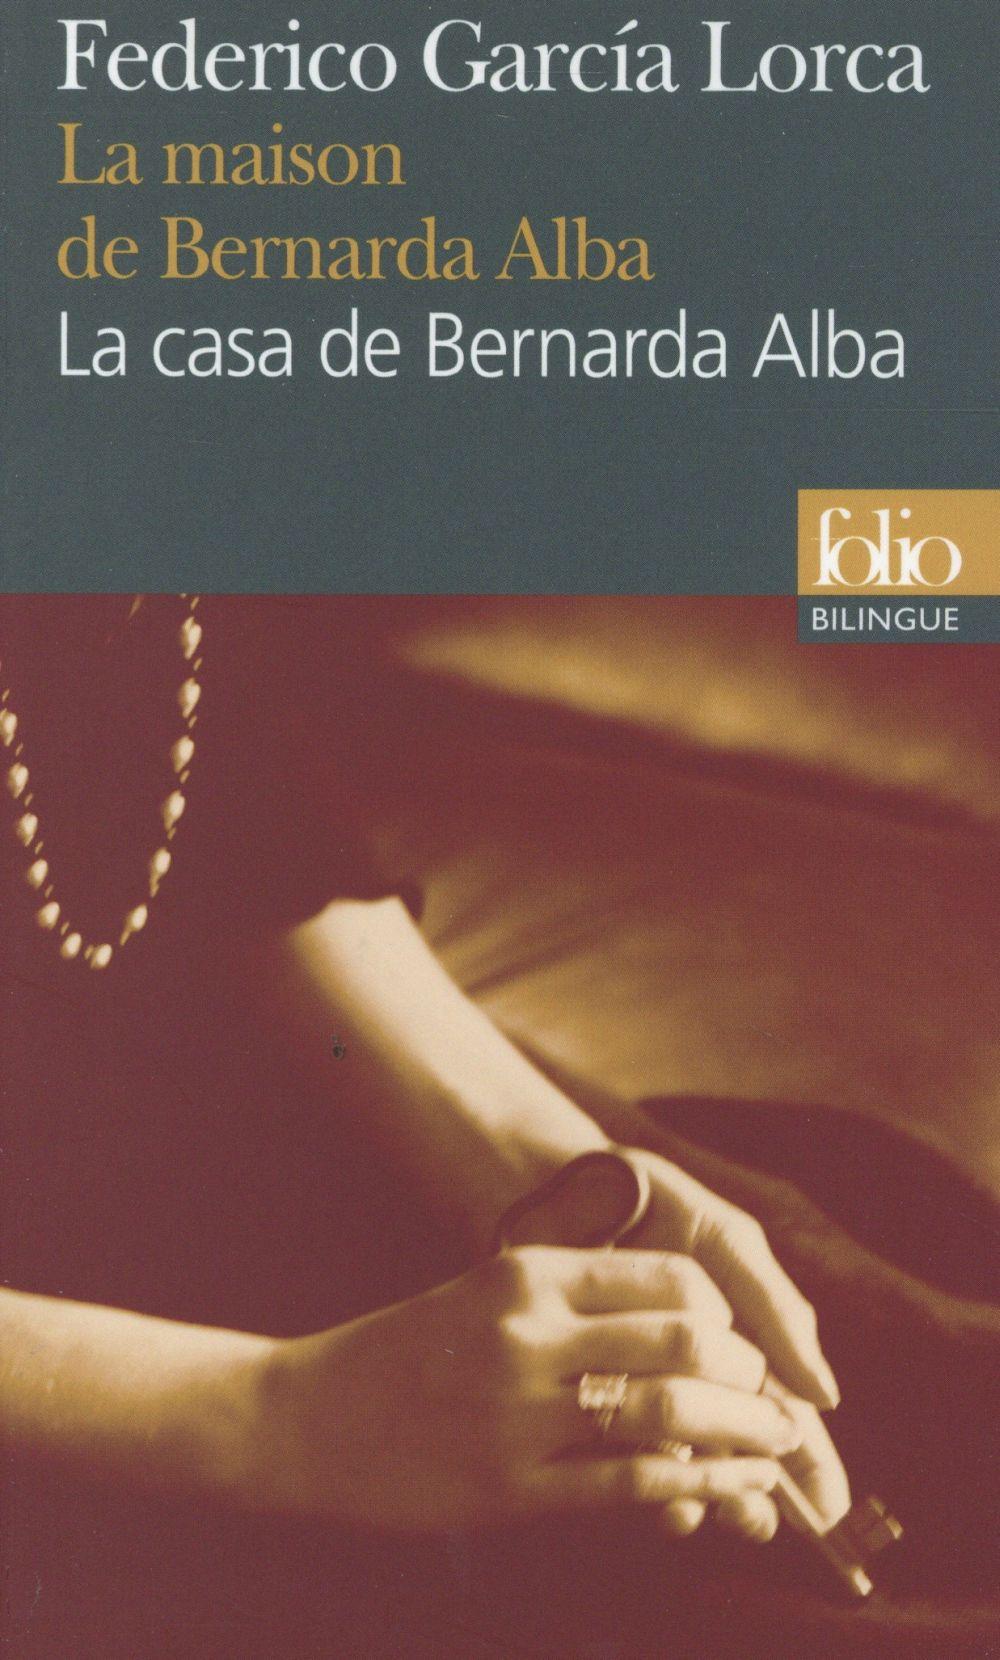 LA MAISON DE BERNARDA ALBALA CASA DE BERNARDA ALBA - DRAME DE FEMMES DANS LES VILLAGES D'ESPAGNEDR